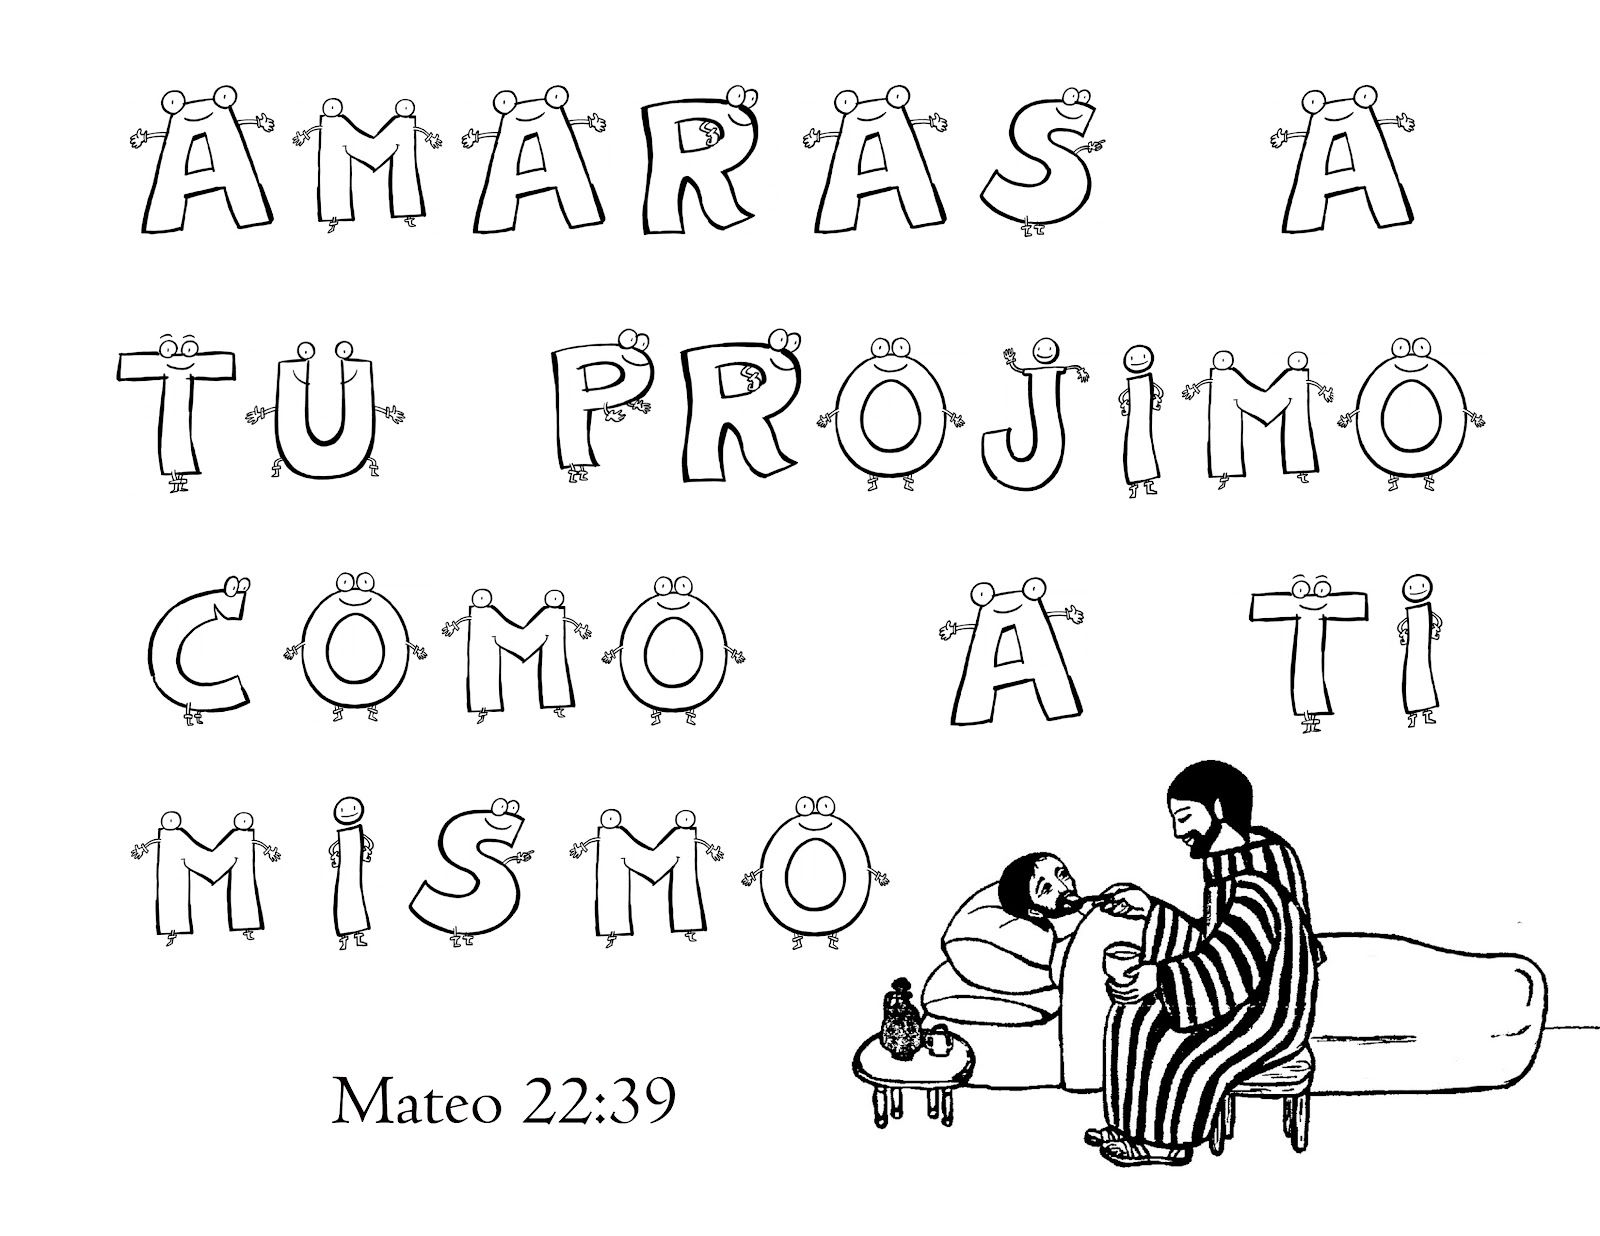 DIBUJOS PARA COLOREAR: TEXTOS BIBLICOS PARA COLOREAR CON